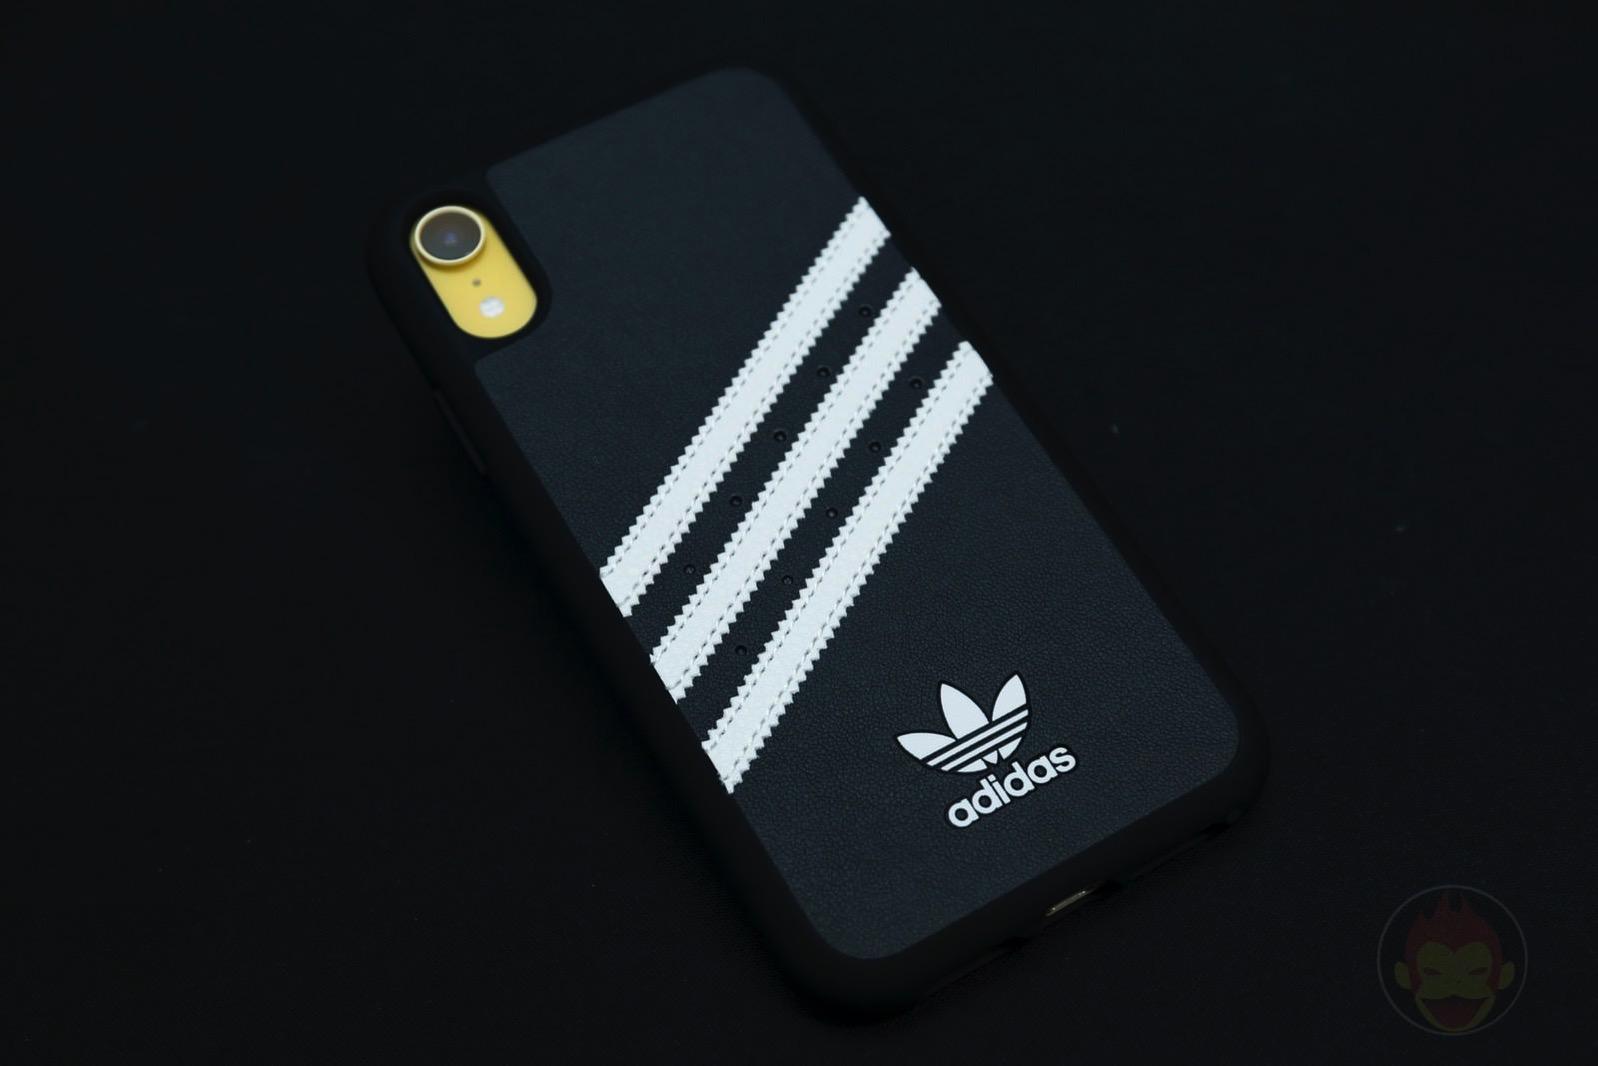 Adidas Originals Moulded Case 01